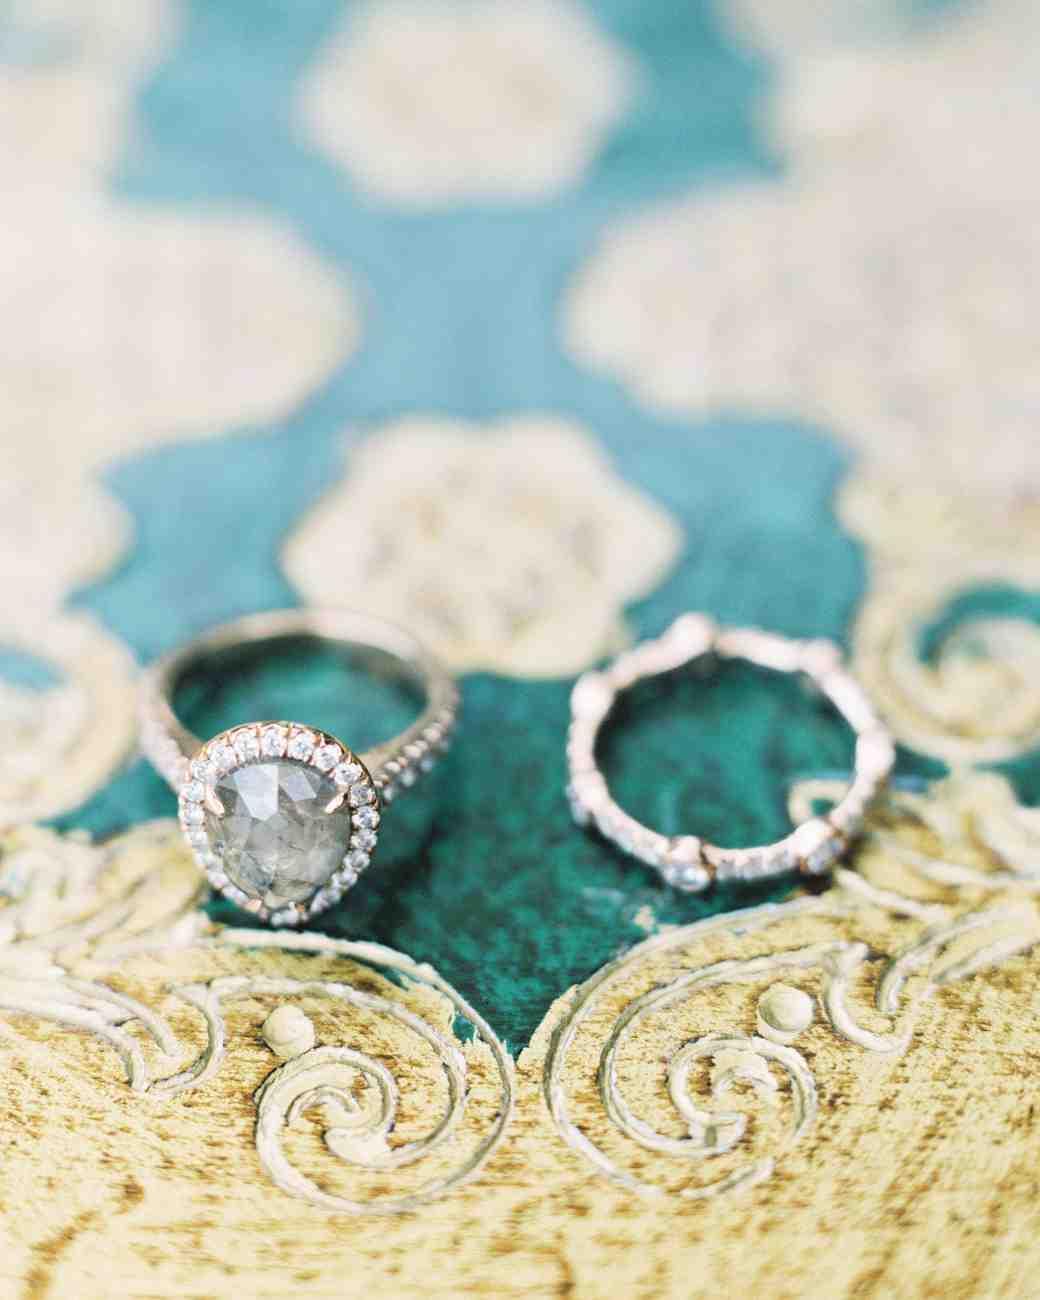 ginny-andrew-wedding-rings-0071-s112676-0216.jpg